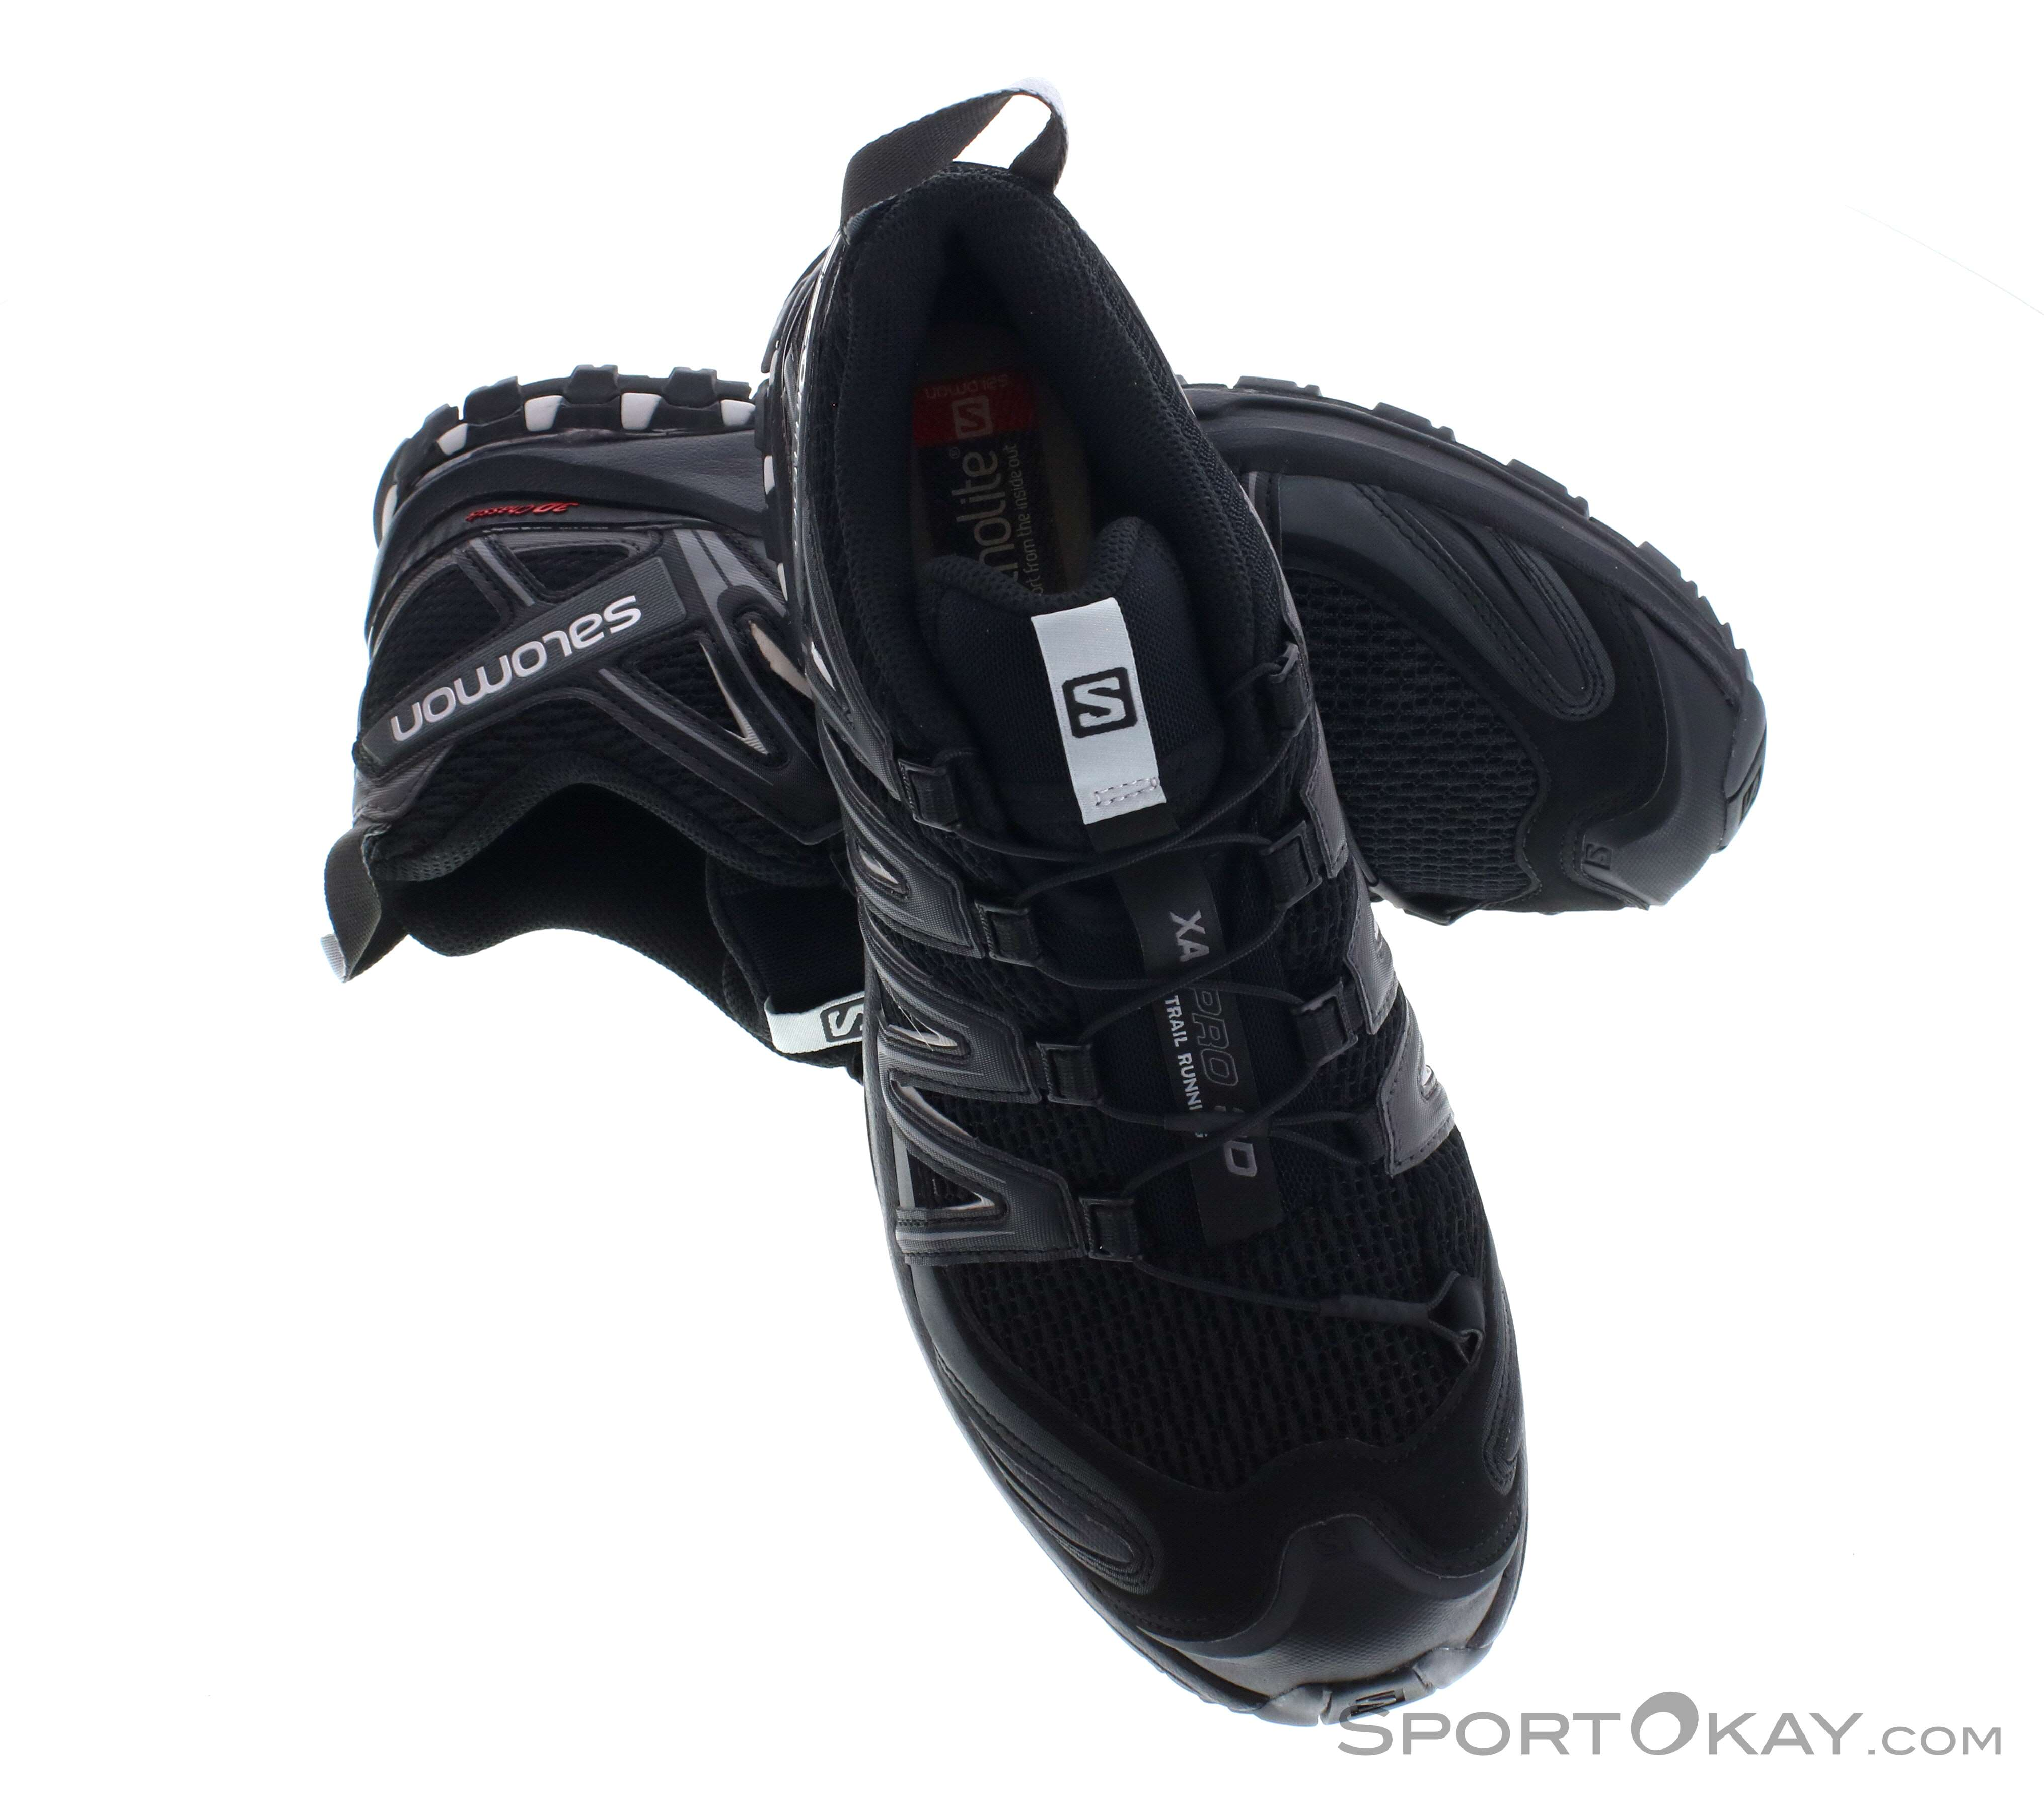 Salomon Salomon XA Pro 3D Mens Trail Running Shoes